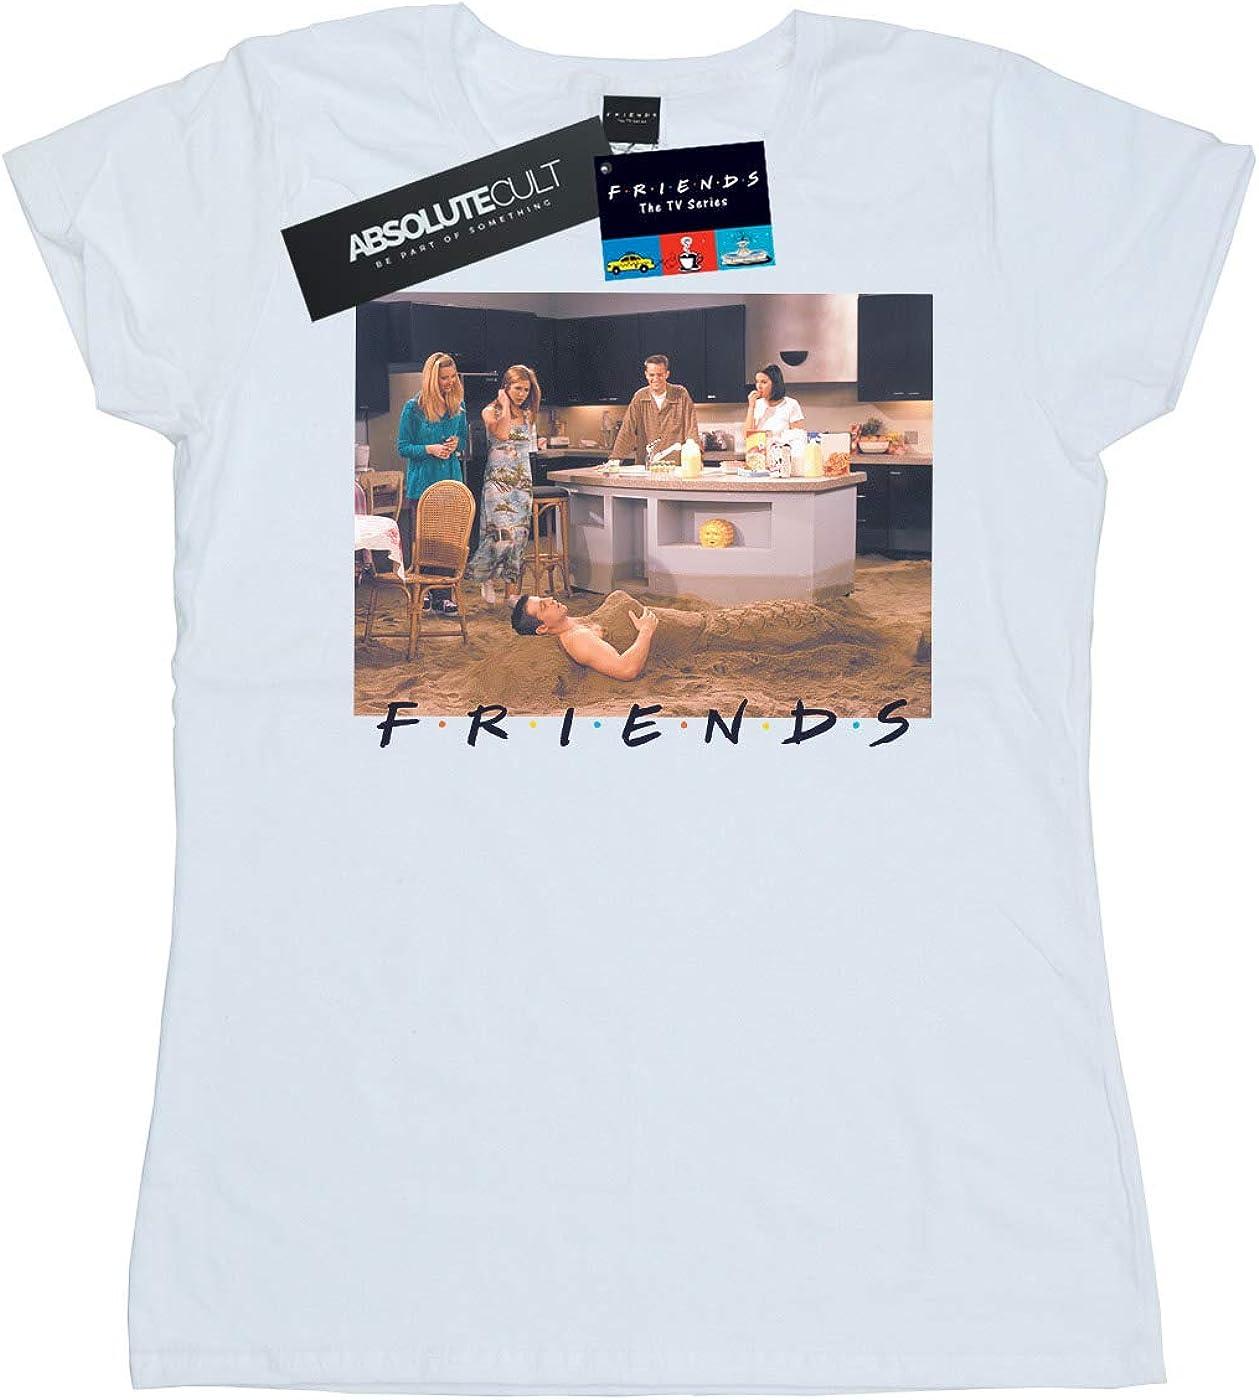 Absolute Cult Friends Mujer Joey Mermaid Camiseta: Amazon.es: Ropa y accesorios